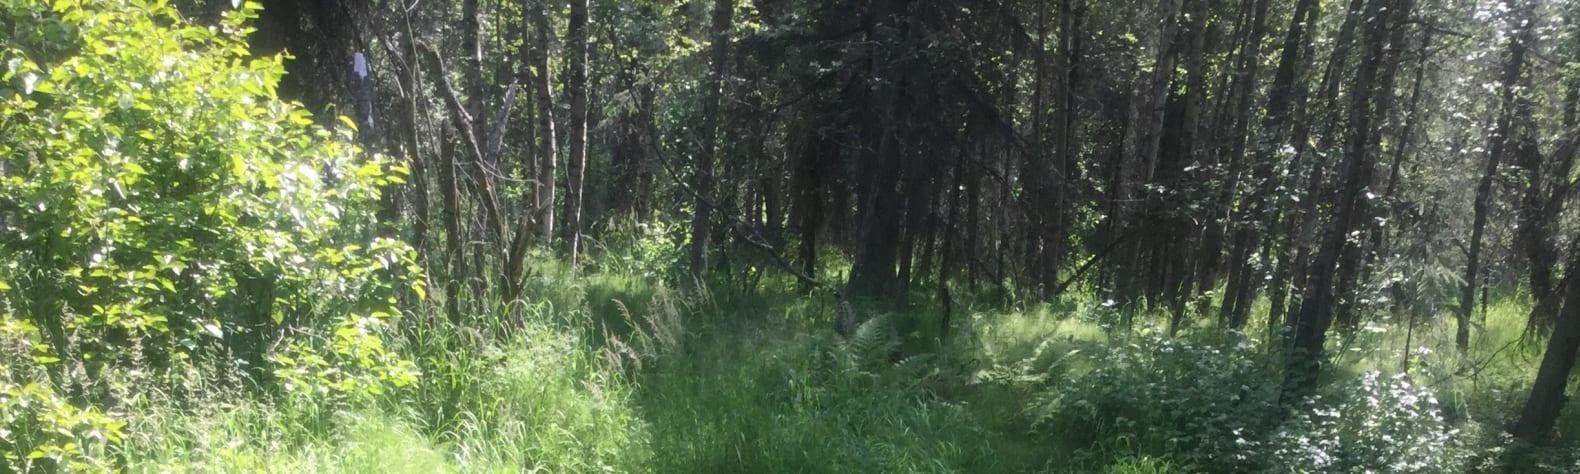 Possum Creek Camp